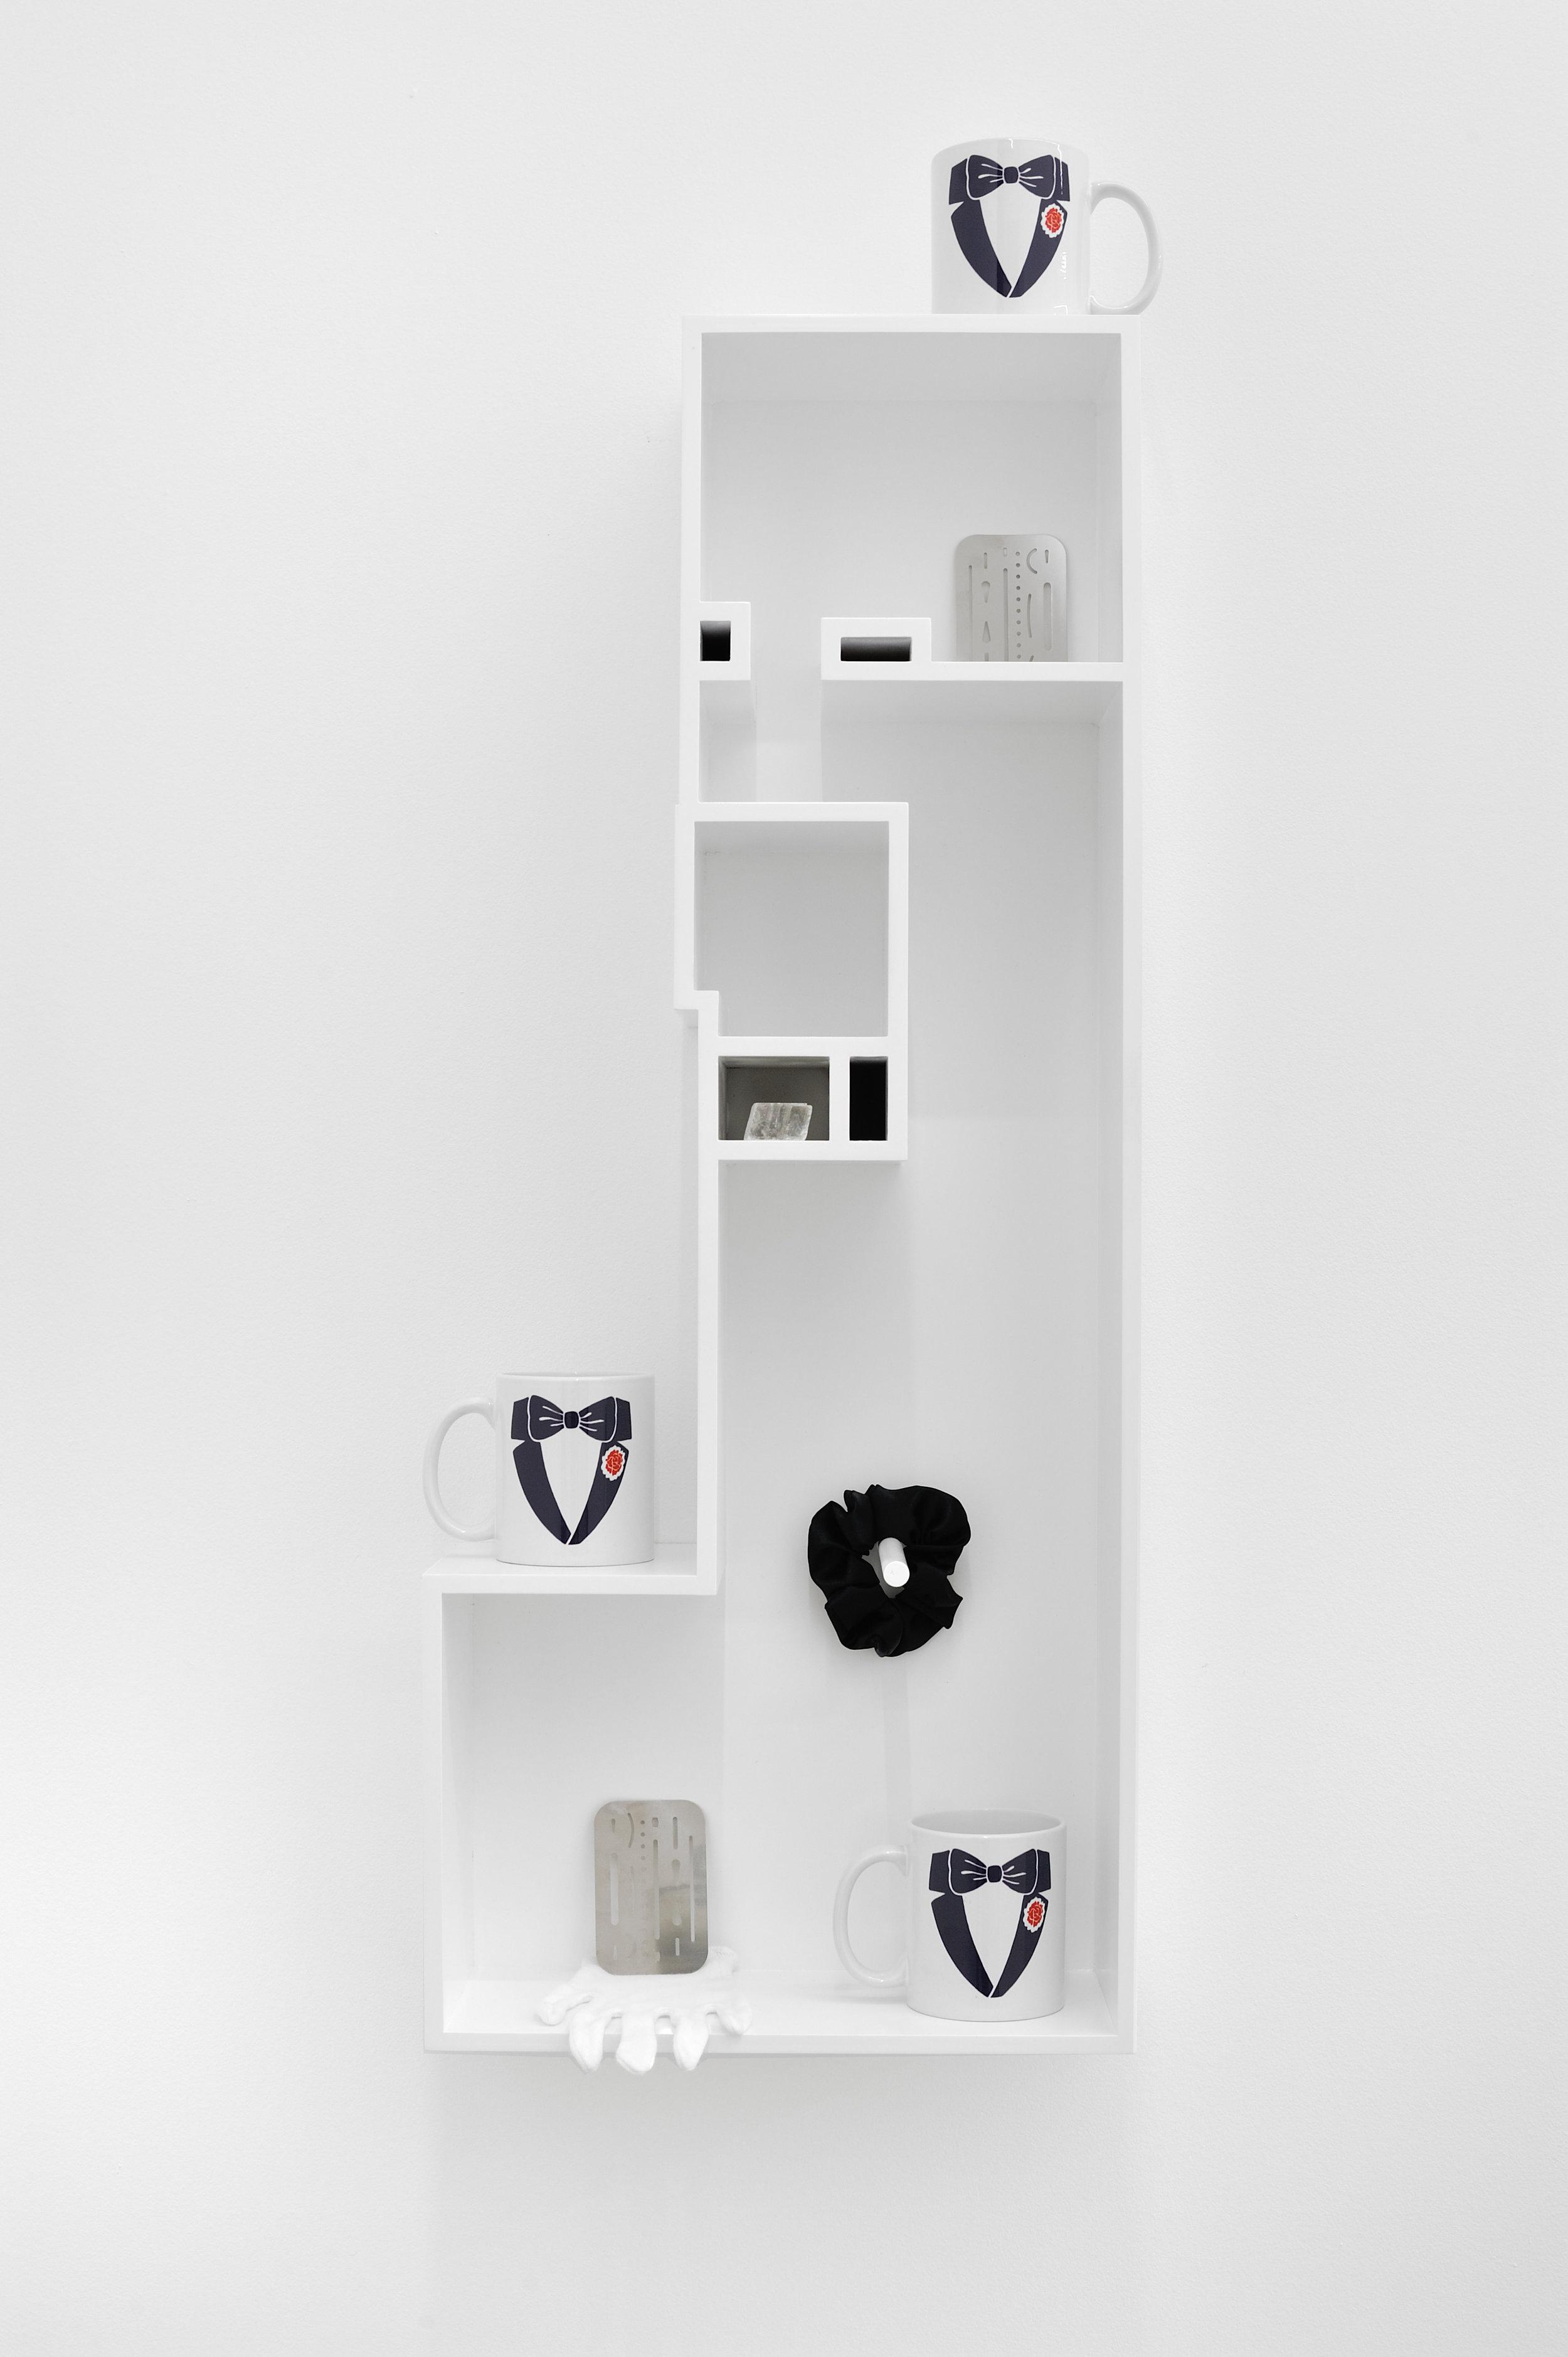 Untitled Model (TRIPLE FORMAL), 2015 MDF, poplar, enamel paint, tuxedo mugs, eraser shields, optical calcite, black scrunchie, preparator's white glove 86,7 x 35,5 x 16,5 cm - 34 1/8 x 14 x 6 1/2 inches